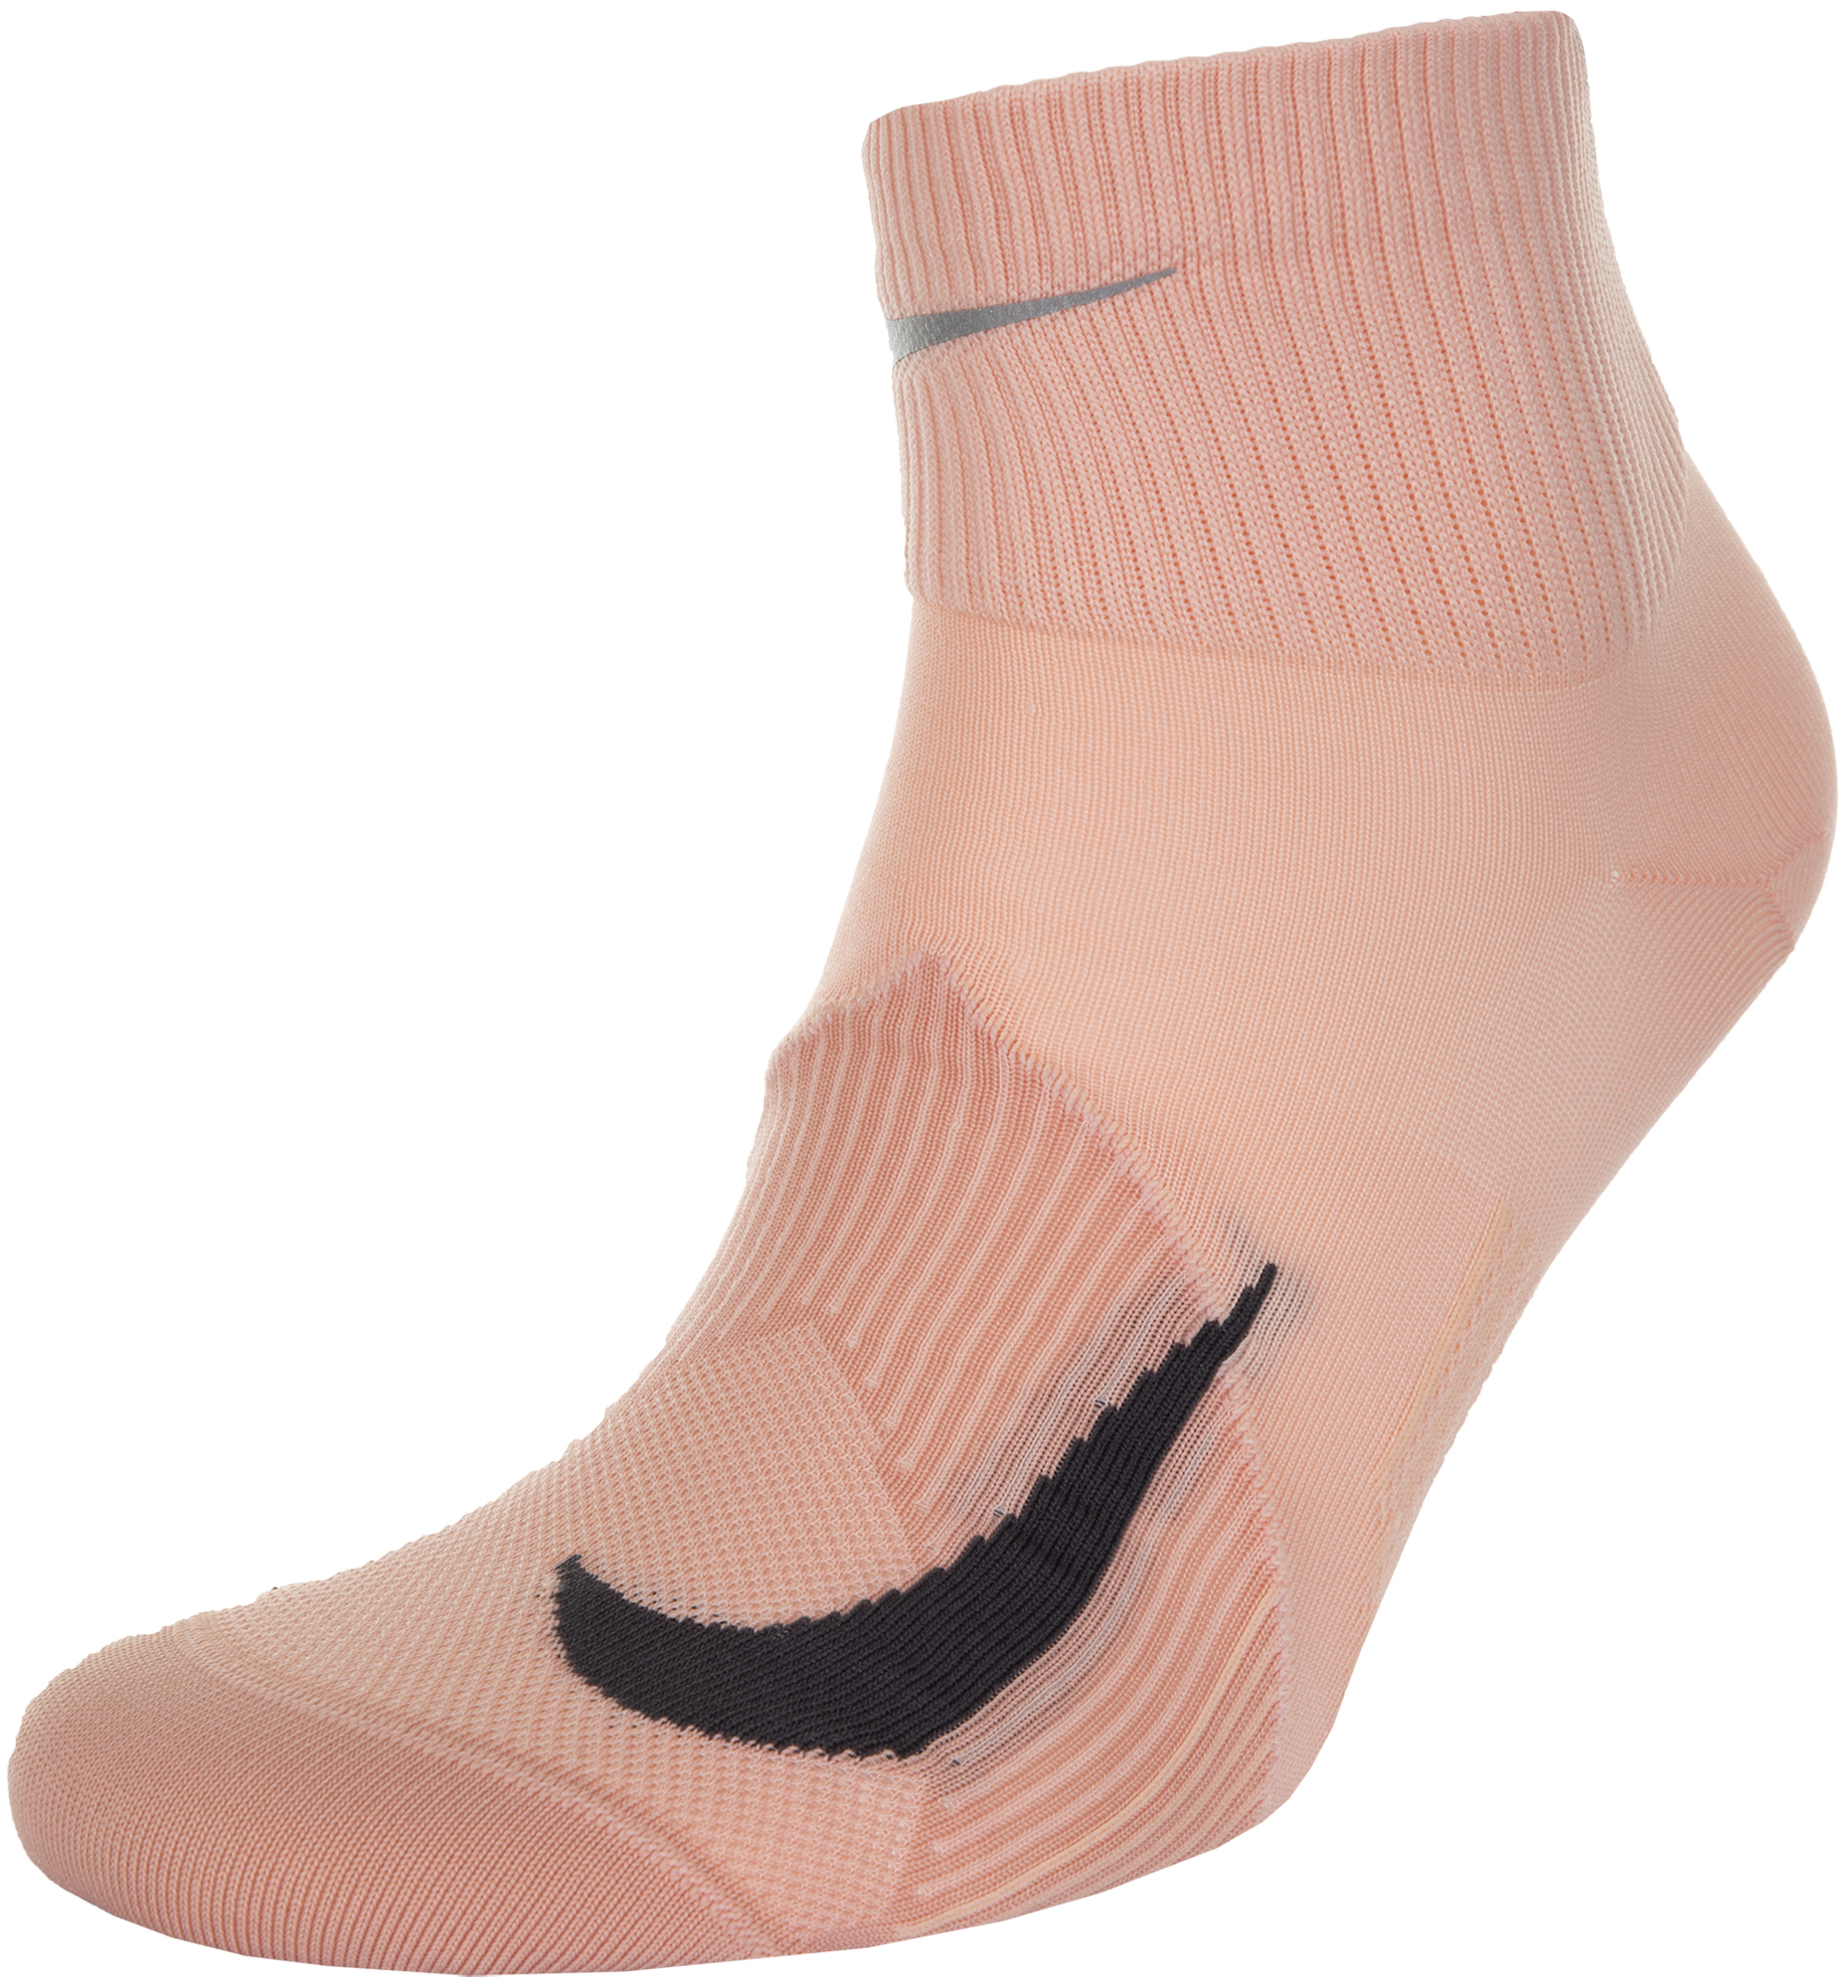 Nike Носки женские Nike Elite Lightweight, размер 40-42